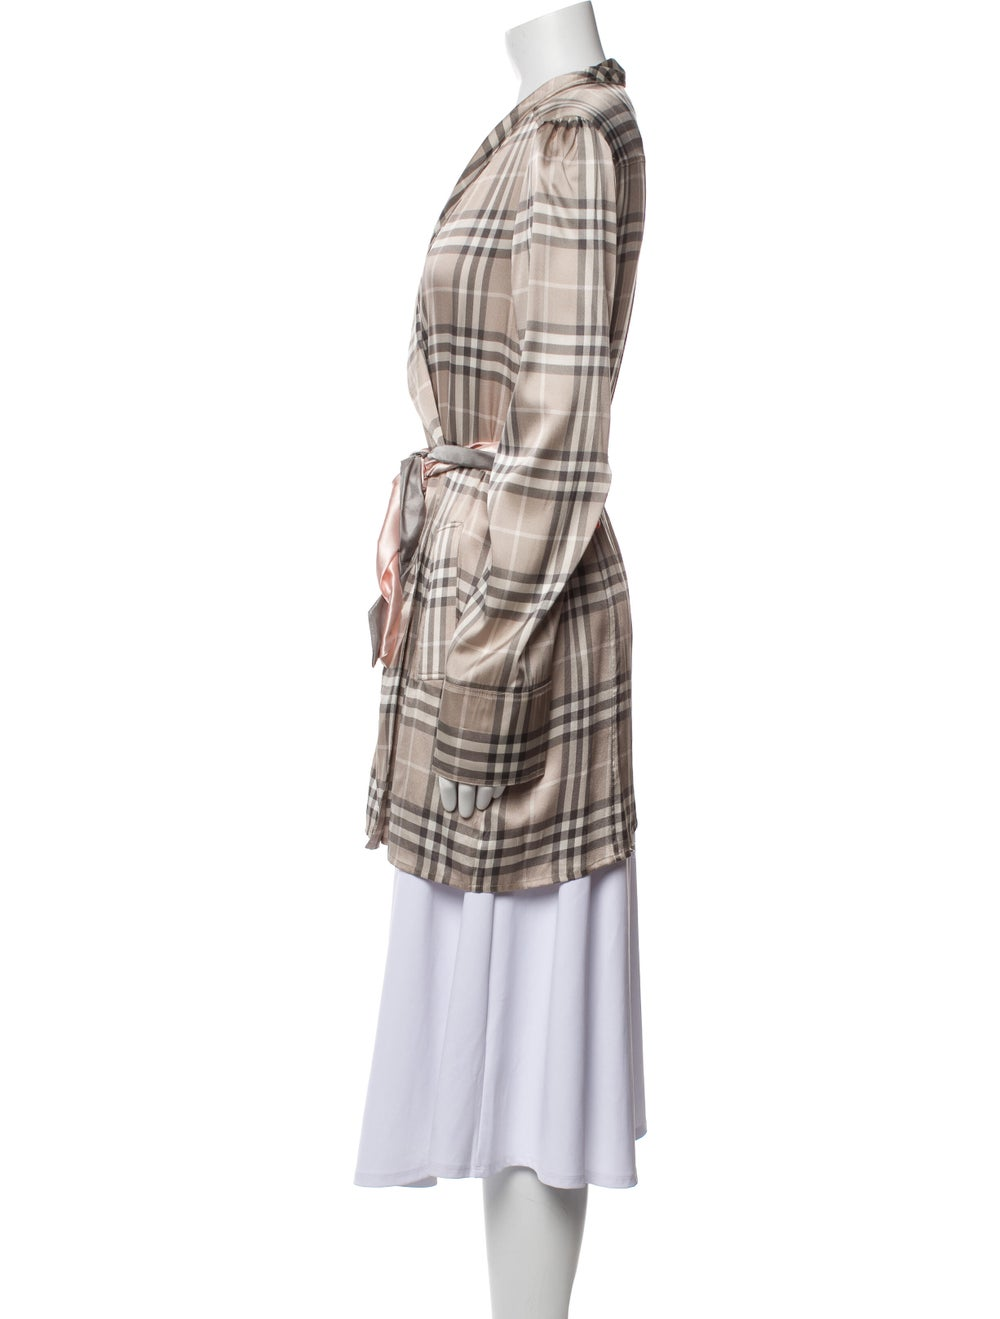 Burberry Silk Plaid Print Robe - image 2